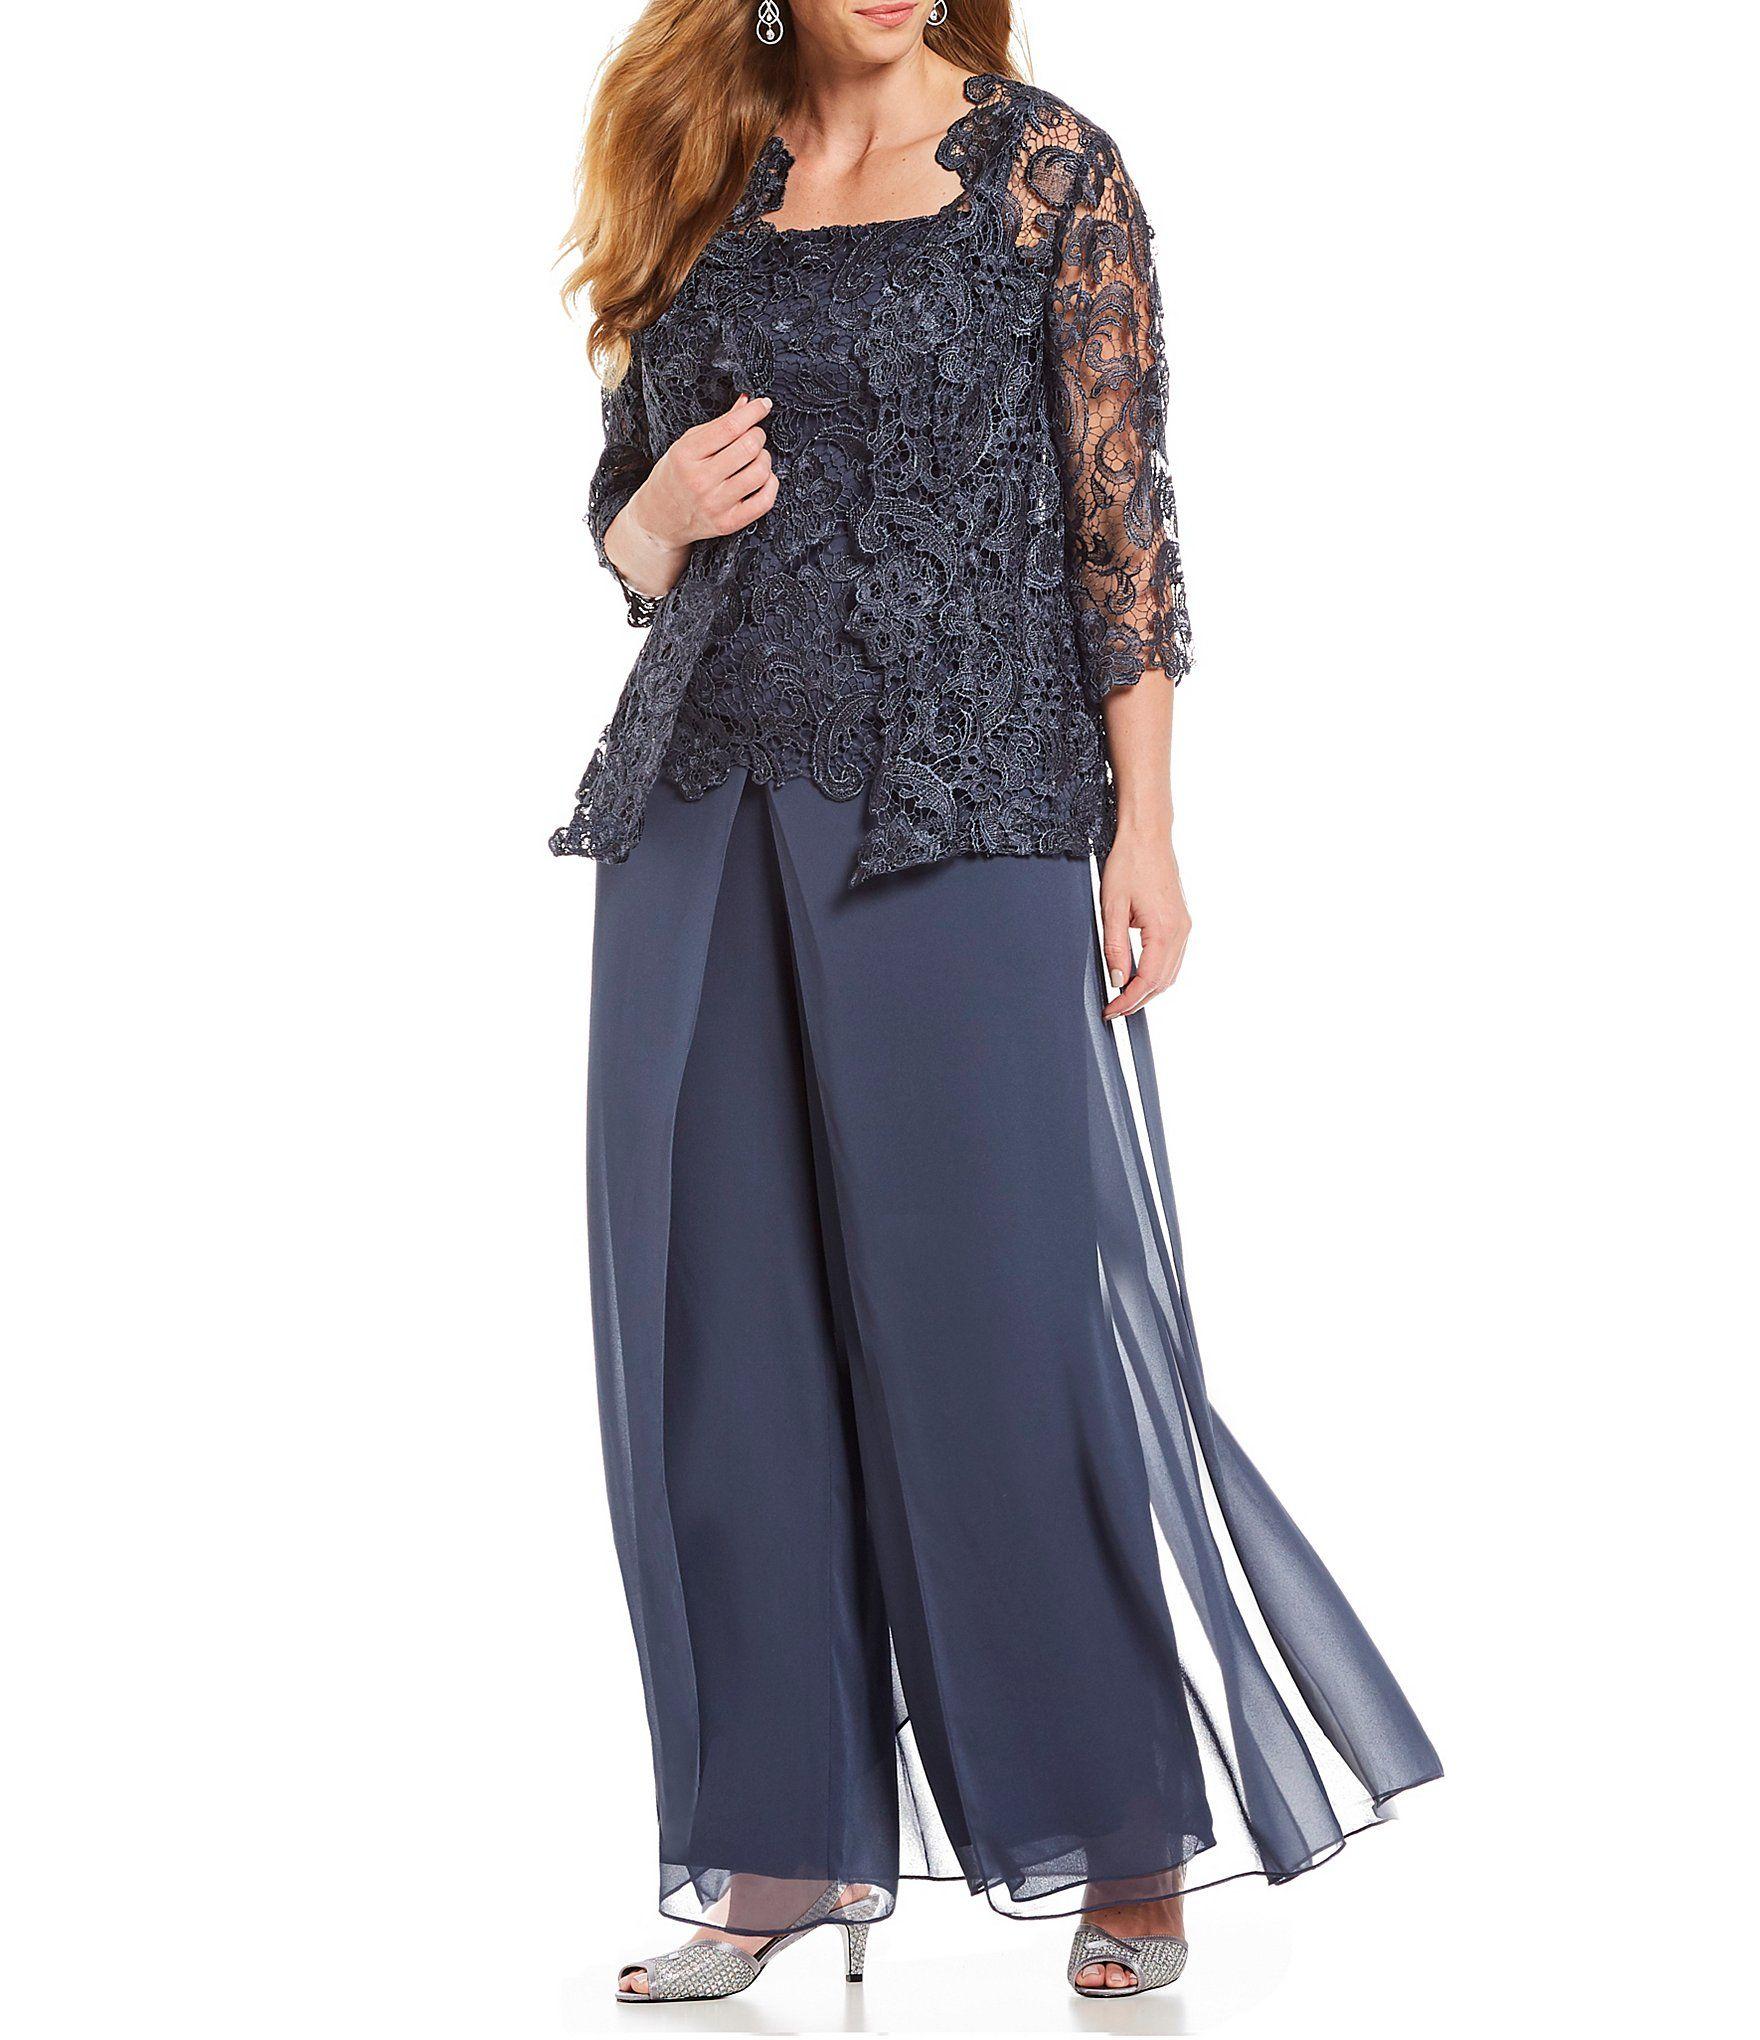 Shop For Emma Street Plus Lace Chiffon 3-Piece Pant Set At